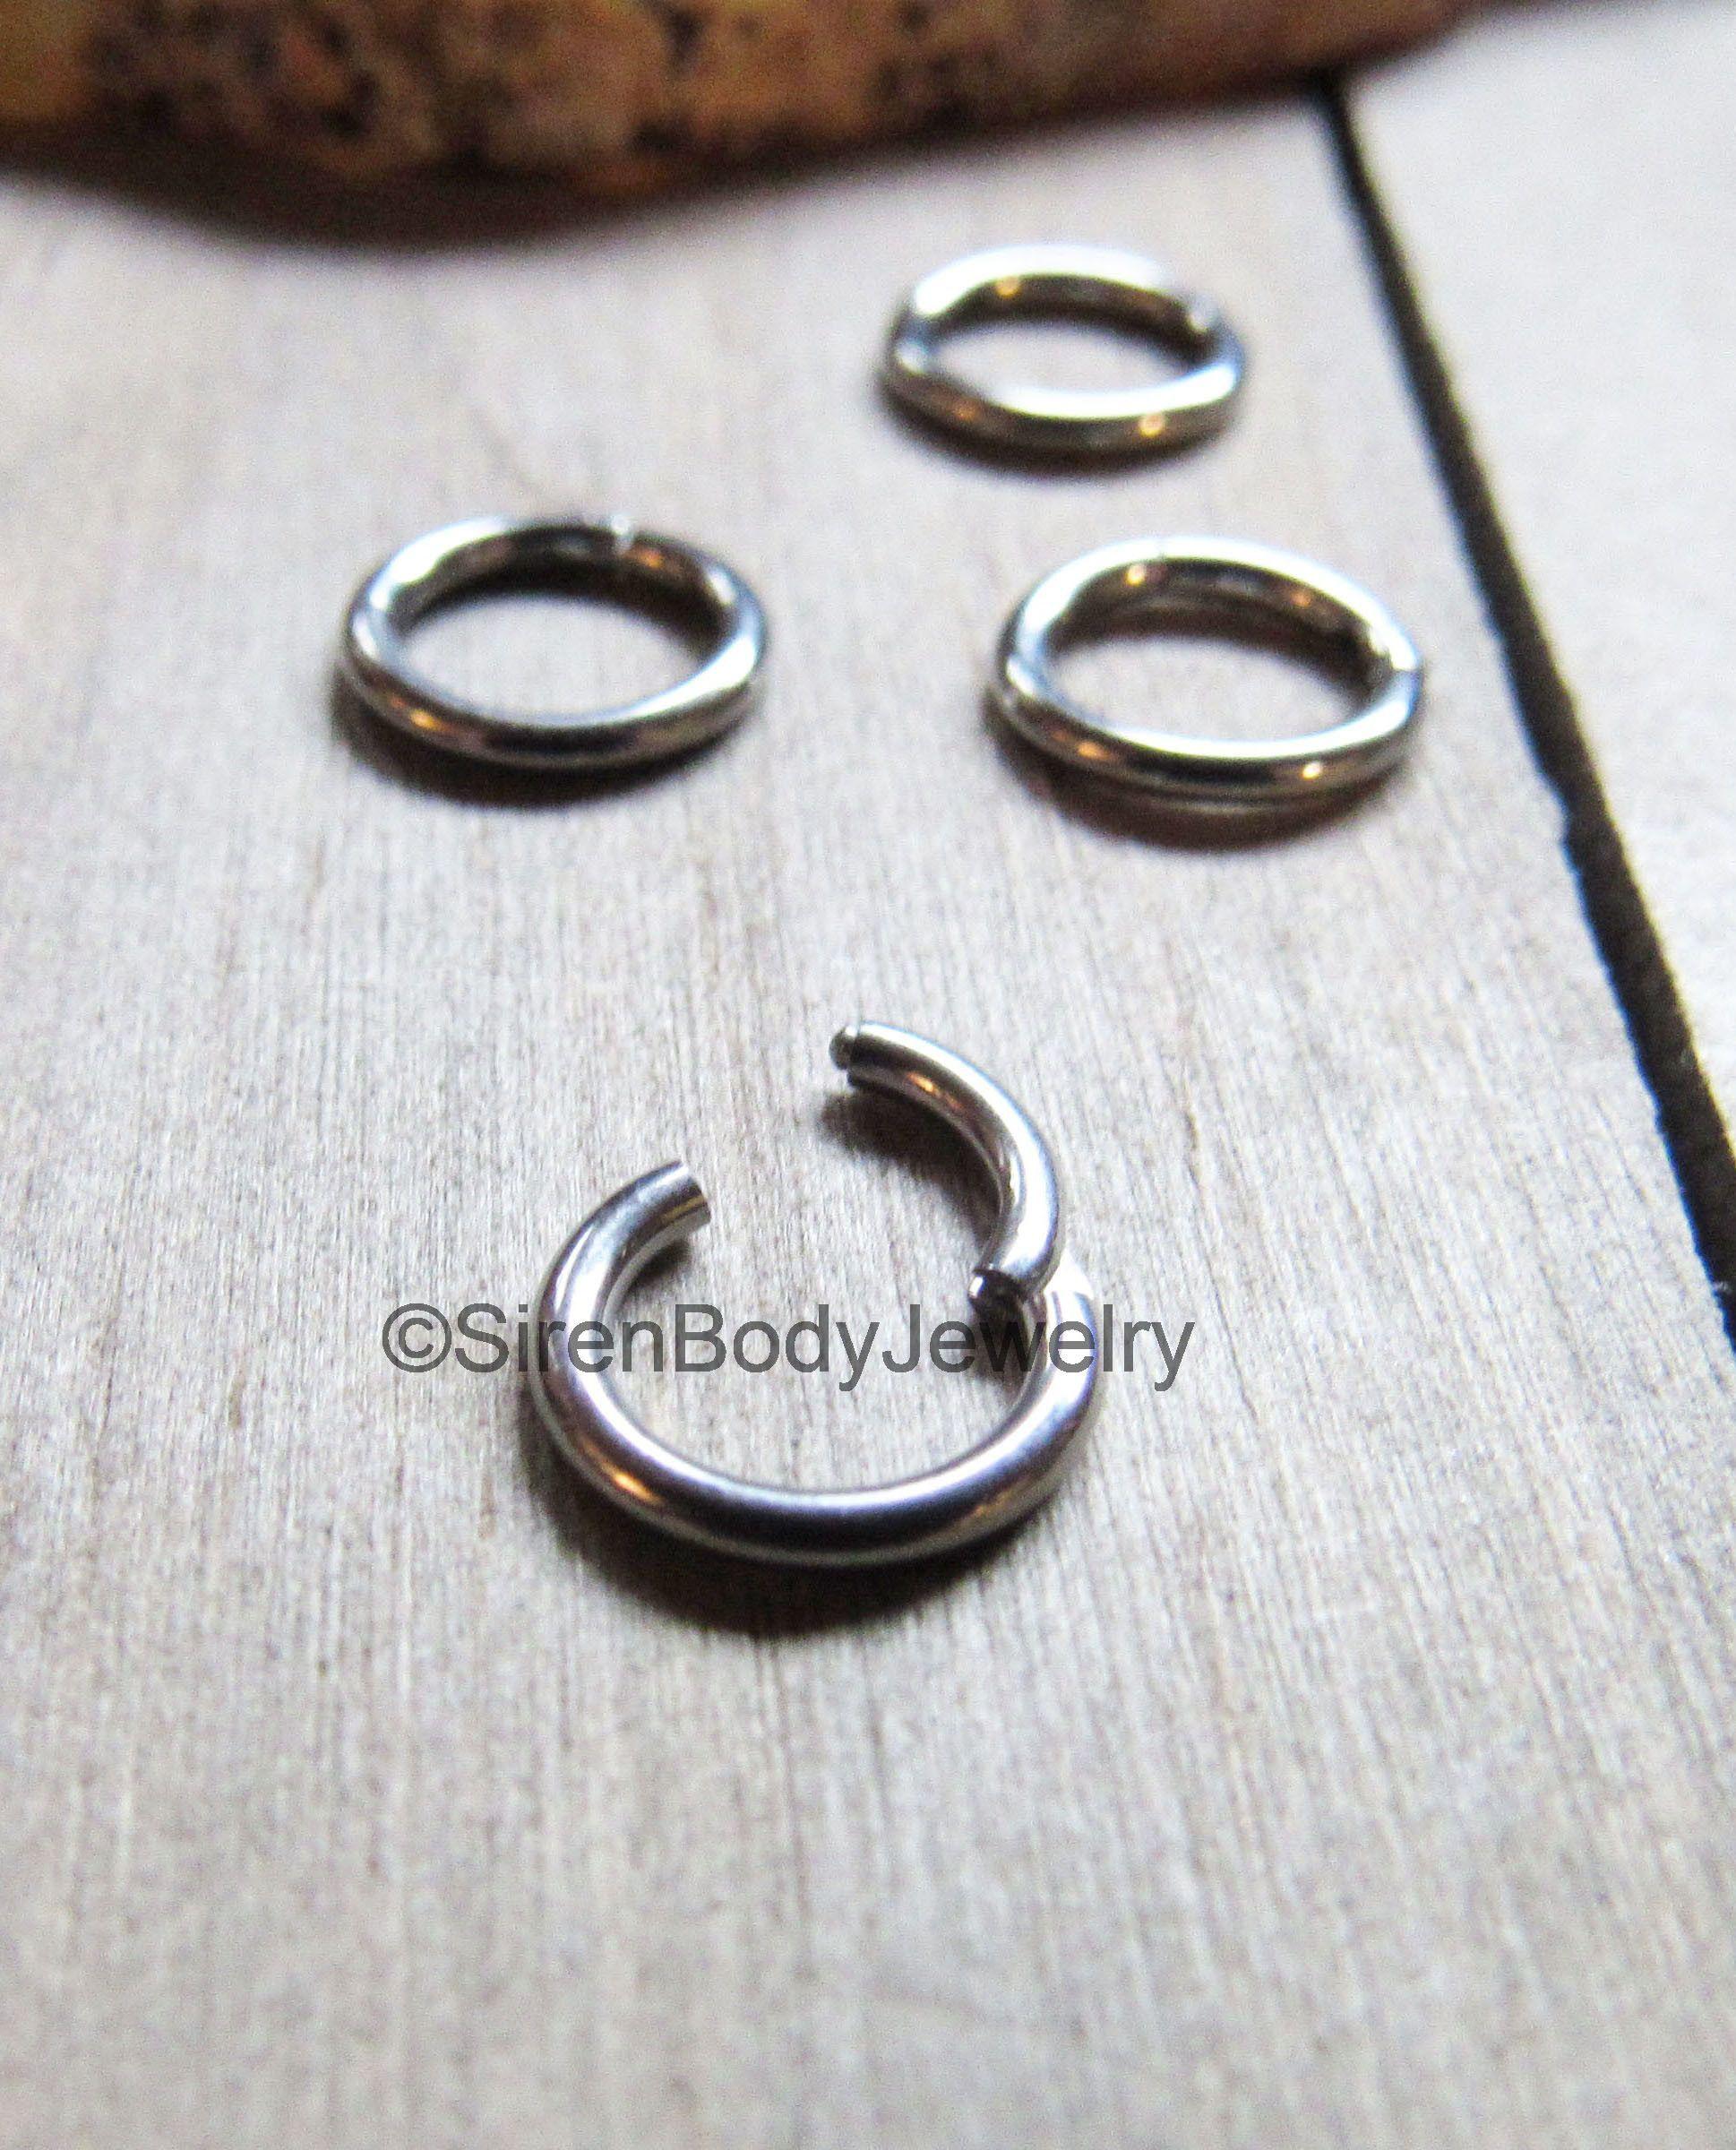 Septum piercing hinged segment ring tiny tragus hoop silver 16g 1 ...